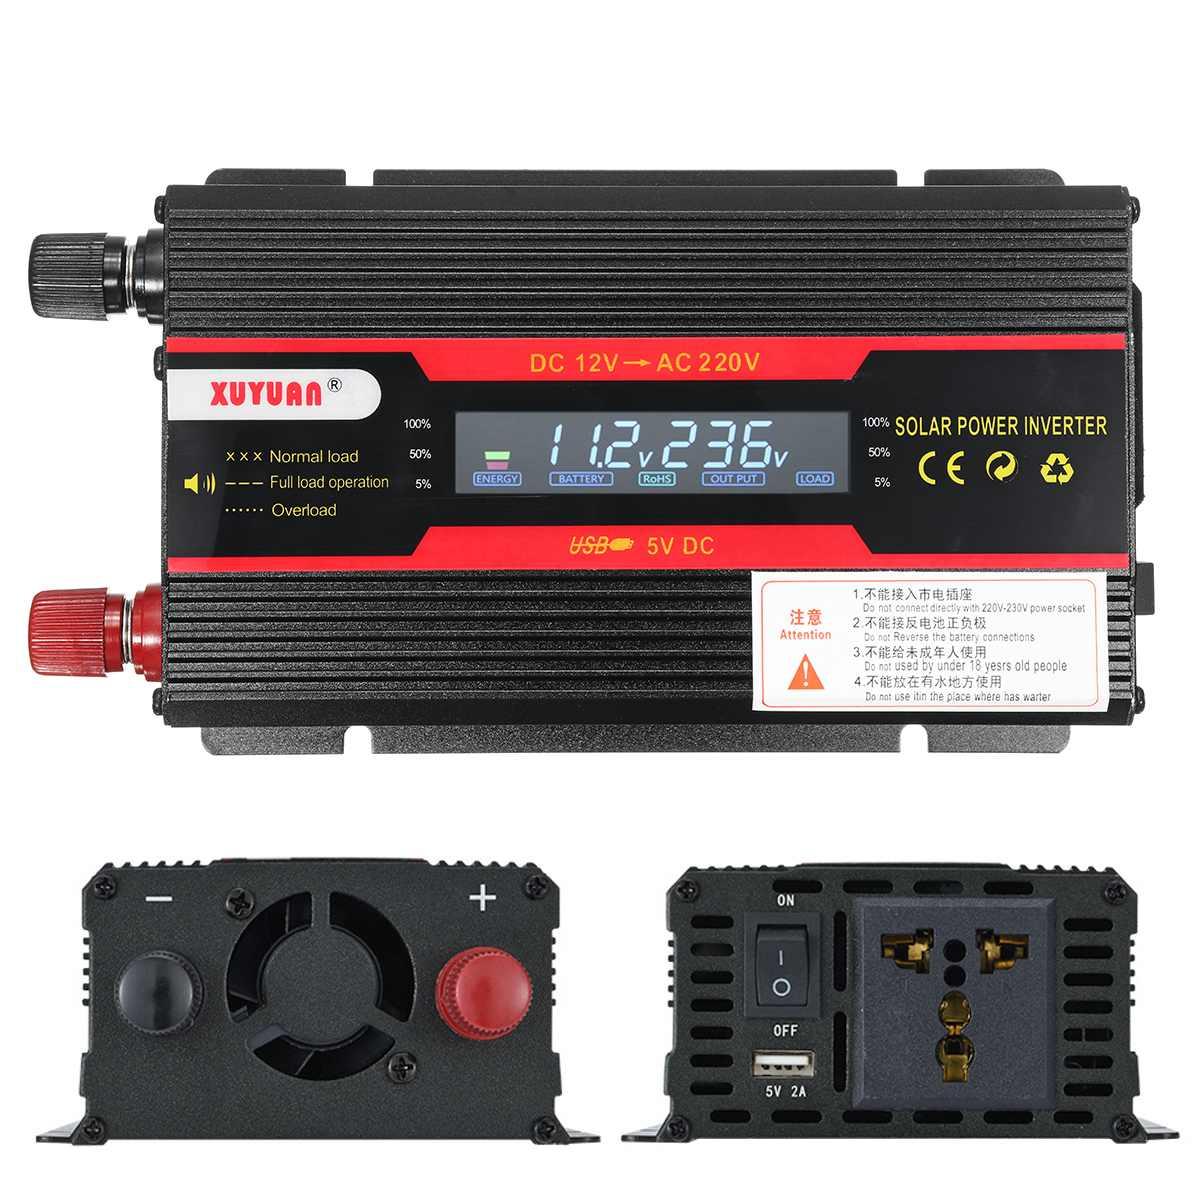 Car Inverter 12V 220V 6000W Pe ak Power Inverter Voltage Convertor Transformer 12V/24V To 110V/220V Inversor + LCD Display 20